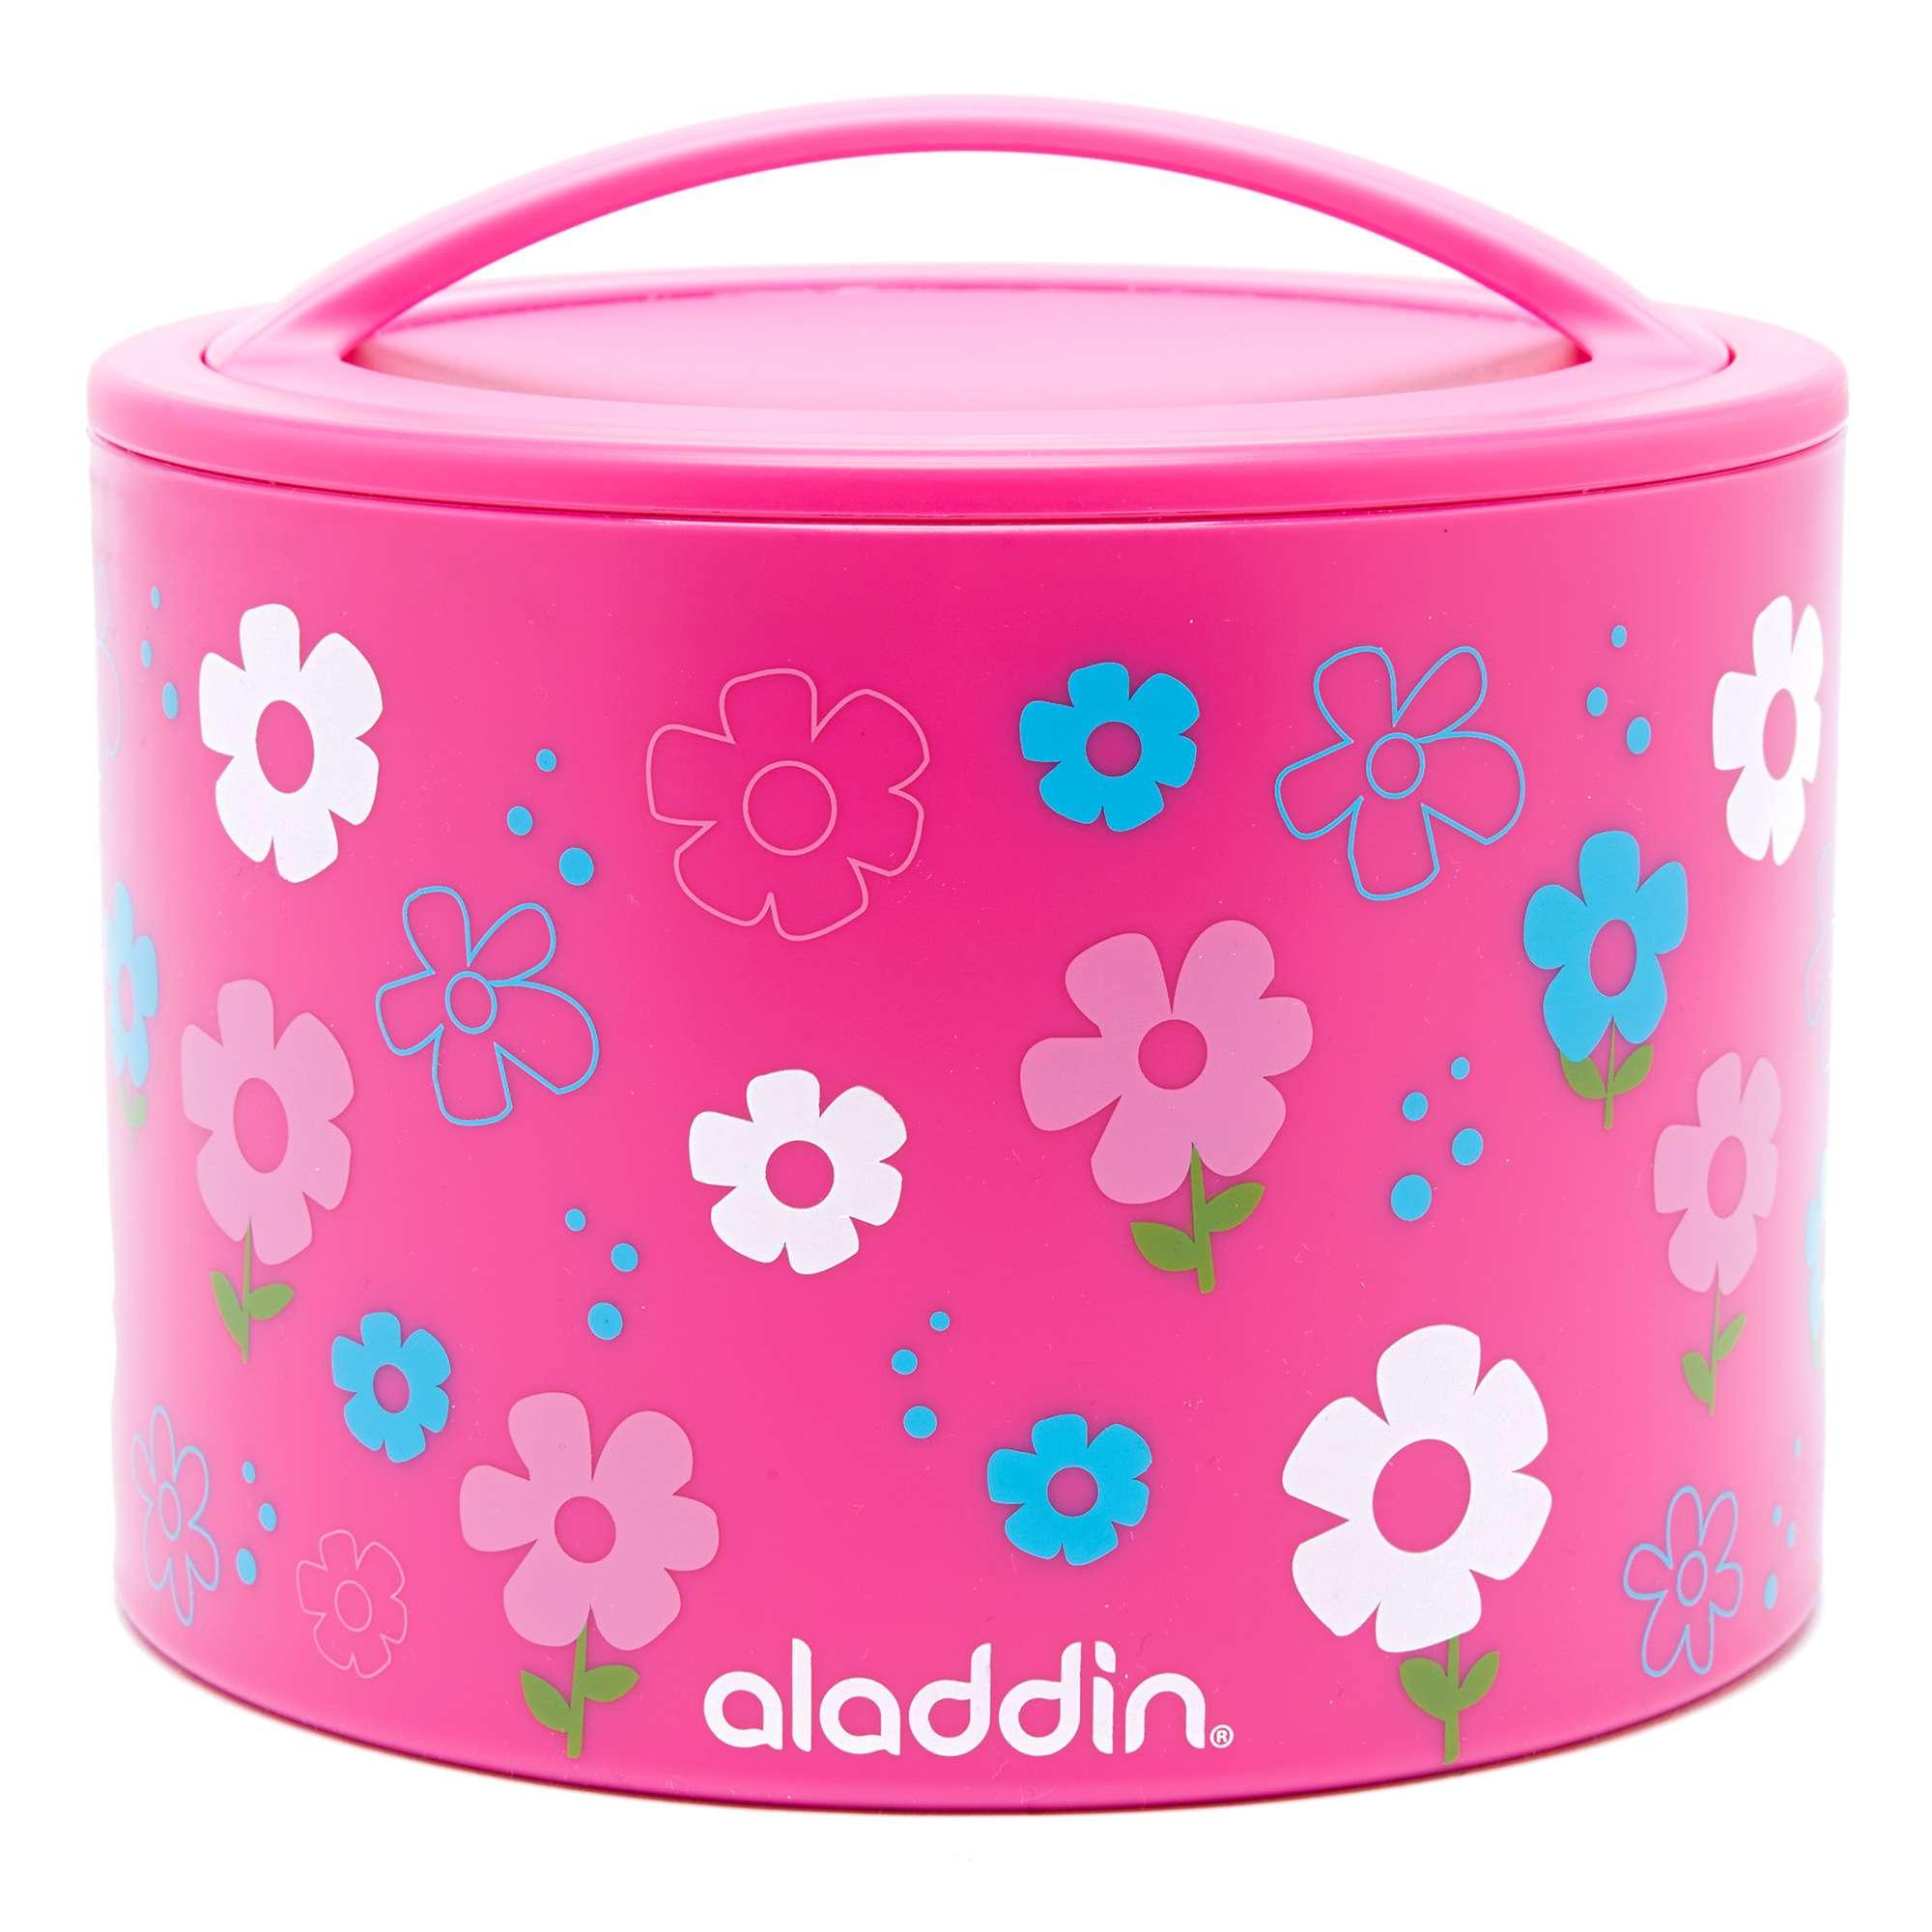 ALADDIN Girl's Bento Lunchbox